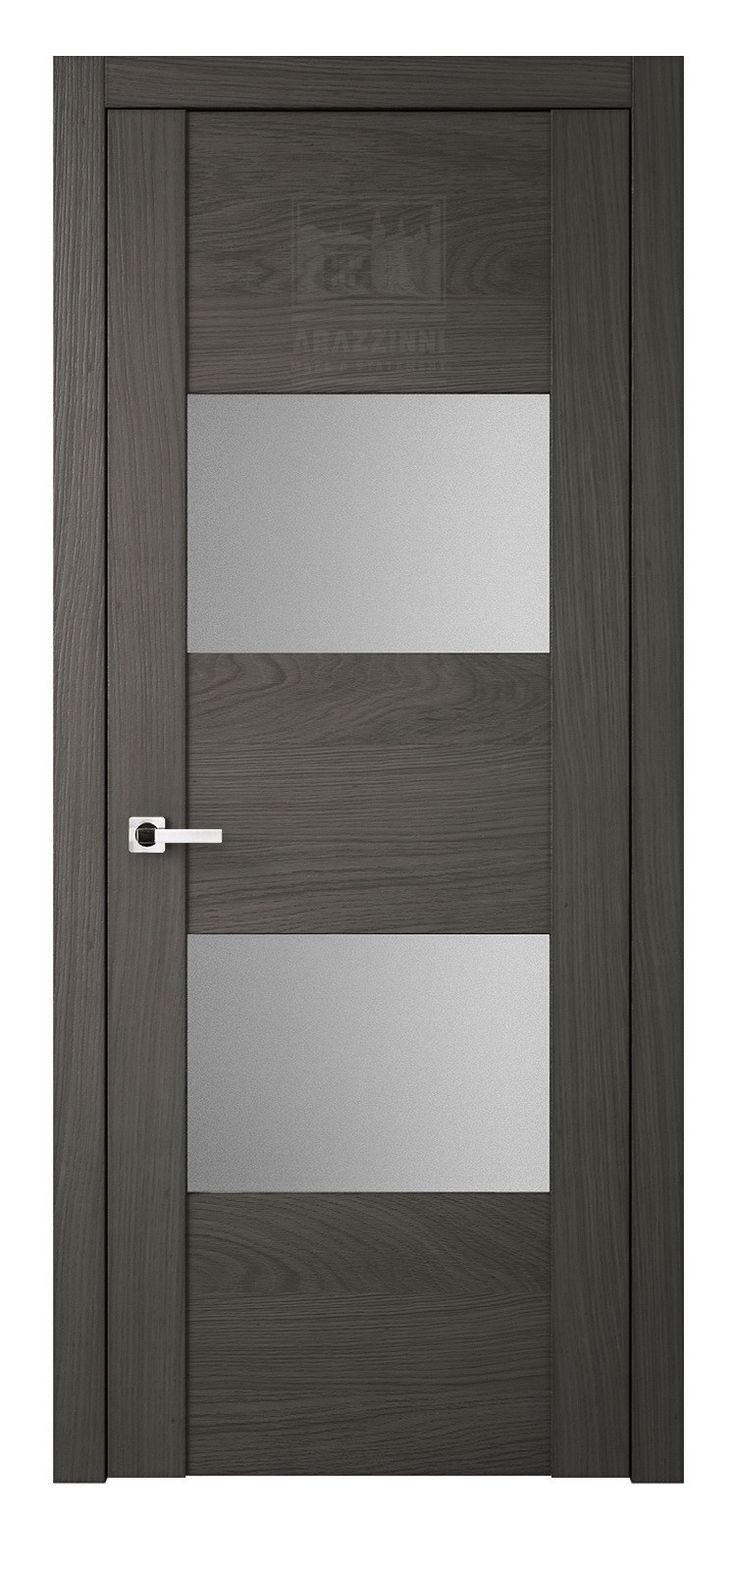 Arazzinni Quadro Q6012 Interior Door Ash Oak